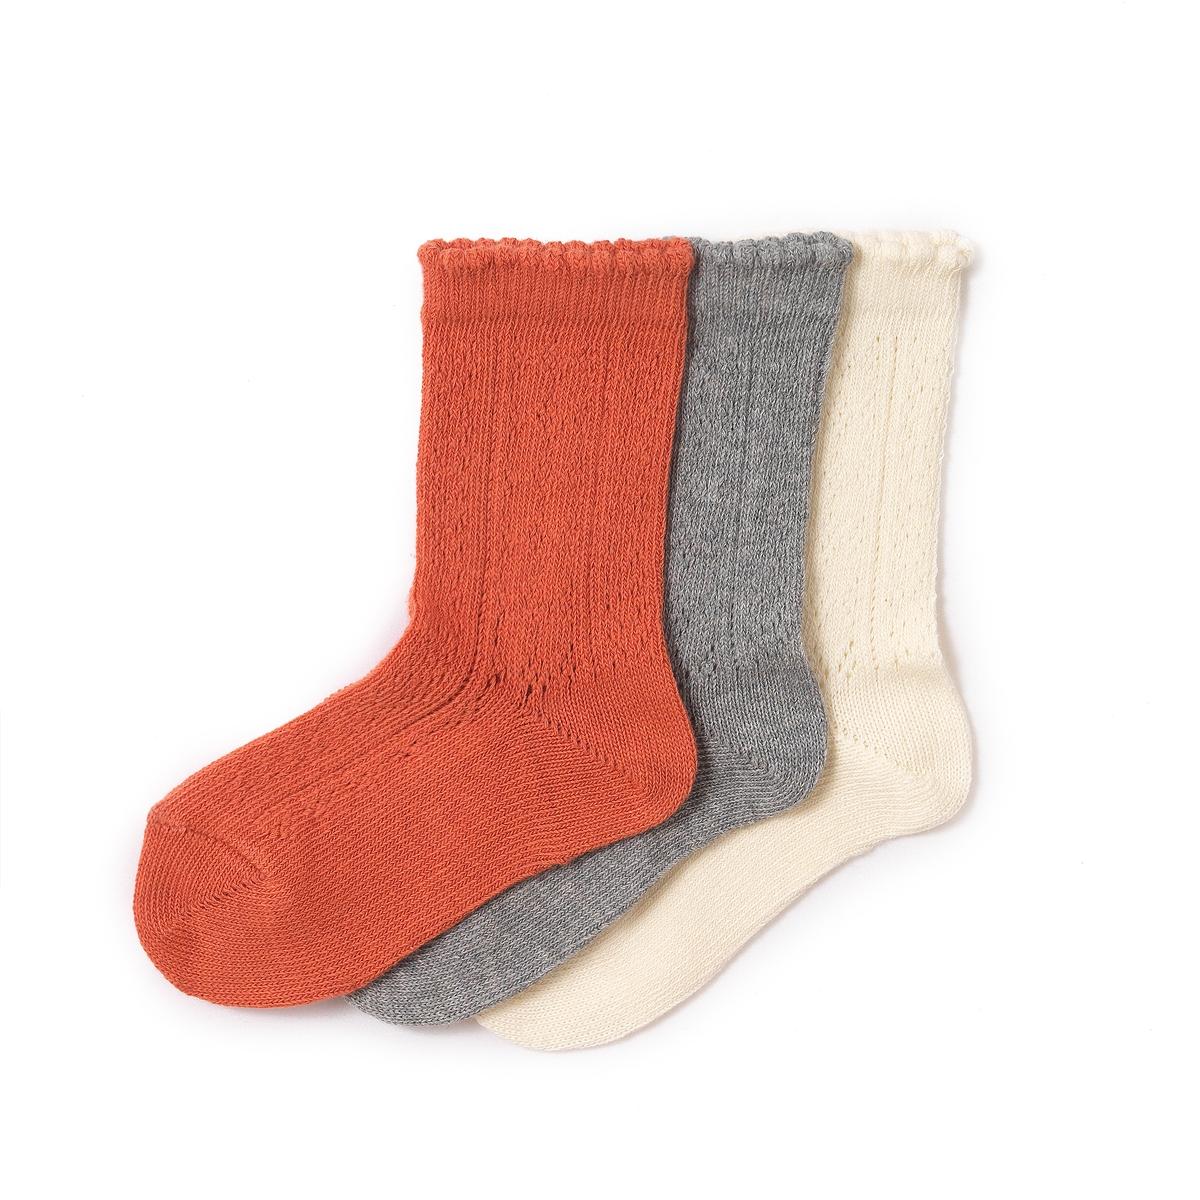 Комплект из 3 пар носков, 3-12 лет от La Redoute